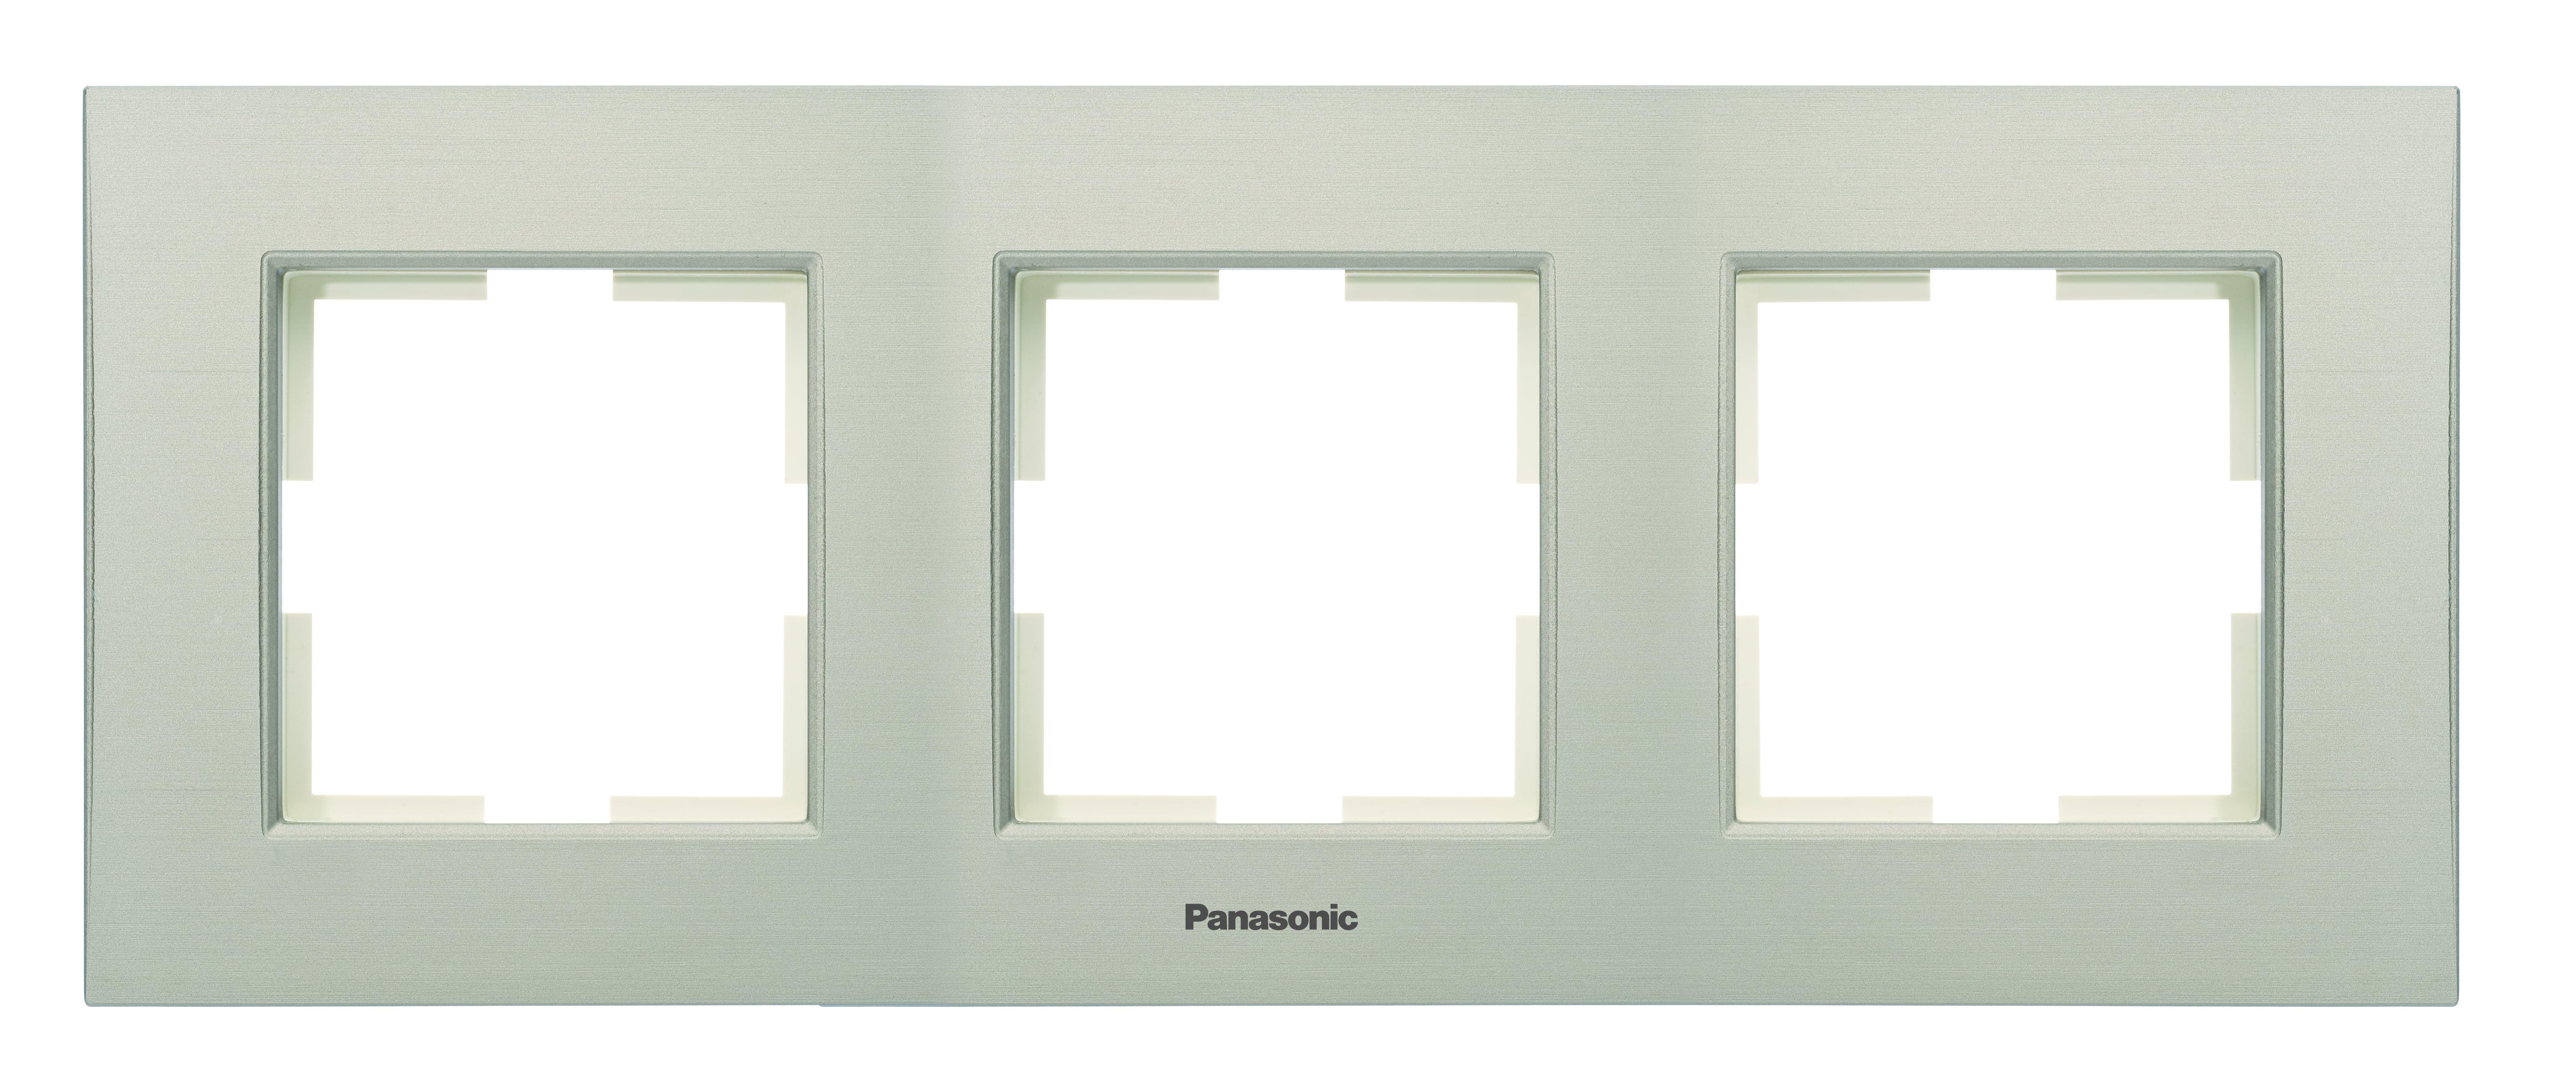 Рамка Panasonic Wktf0802-2dg-res karre plus dg рамка для фото jardo